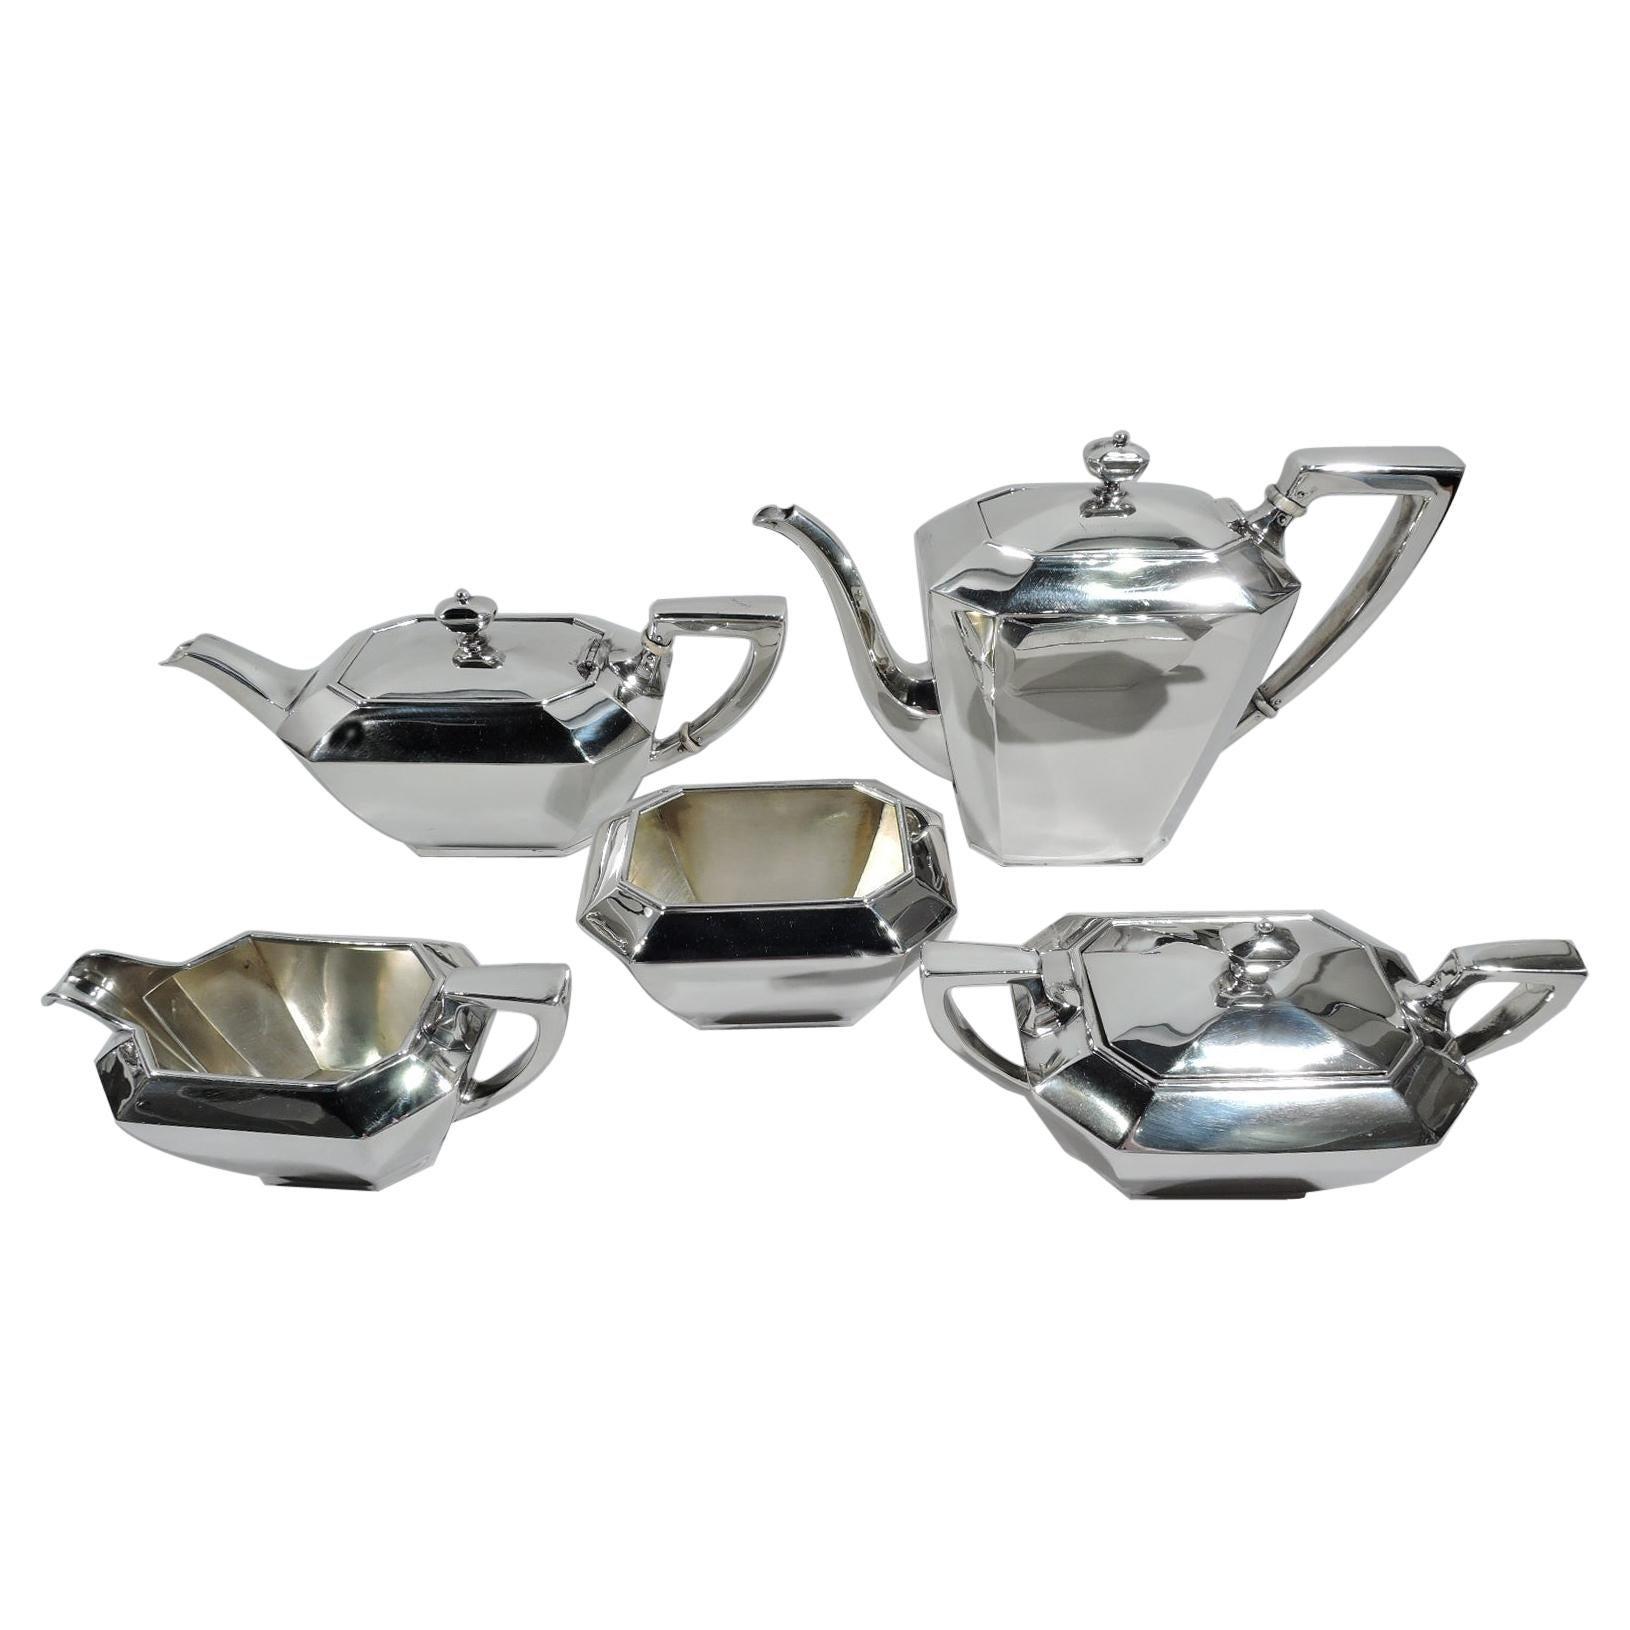 Gorham Fairfax Art Deco Sterling Silver 5-Piece Coffee and Tea Set